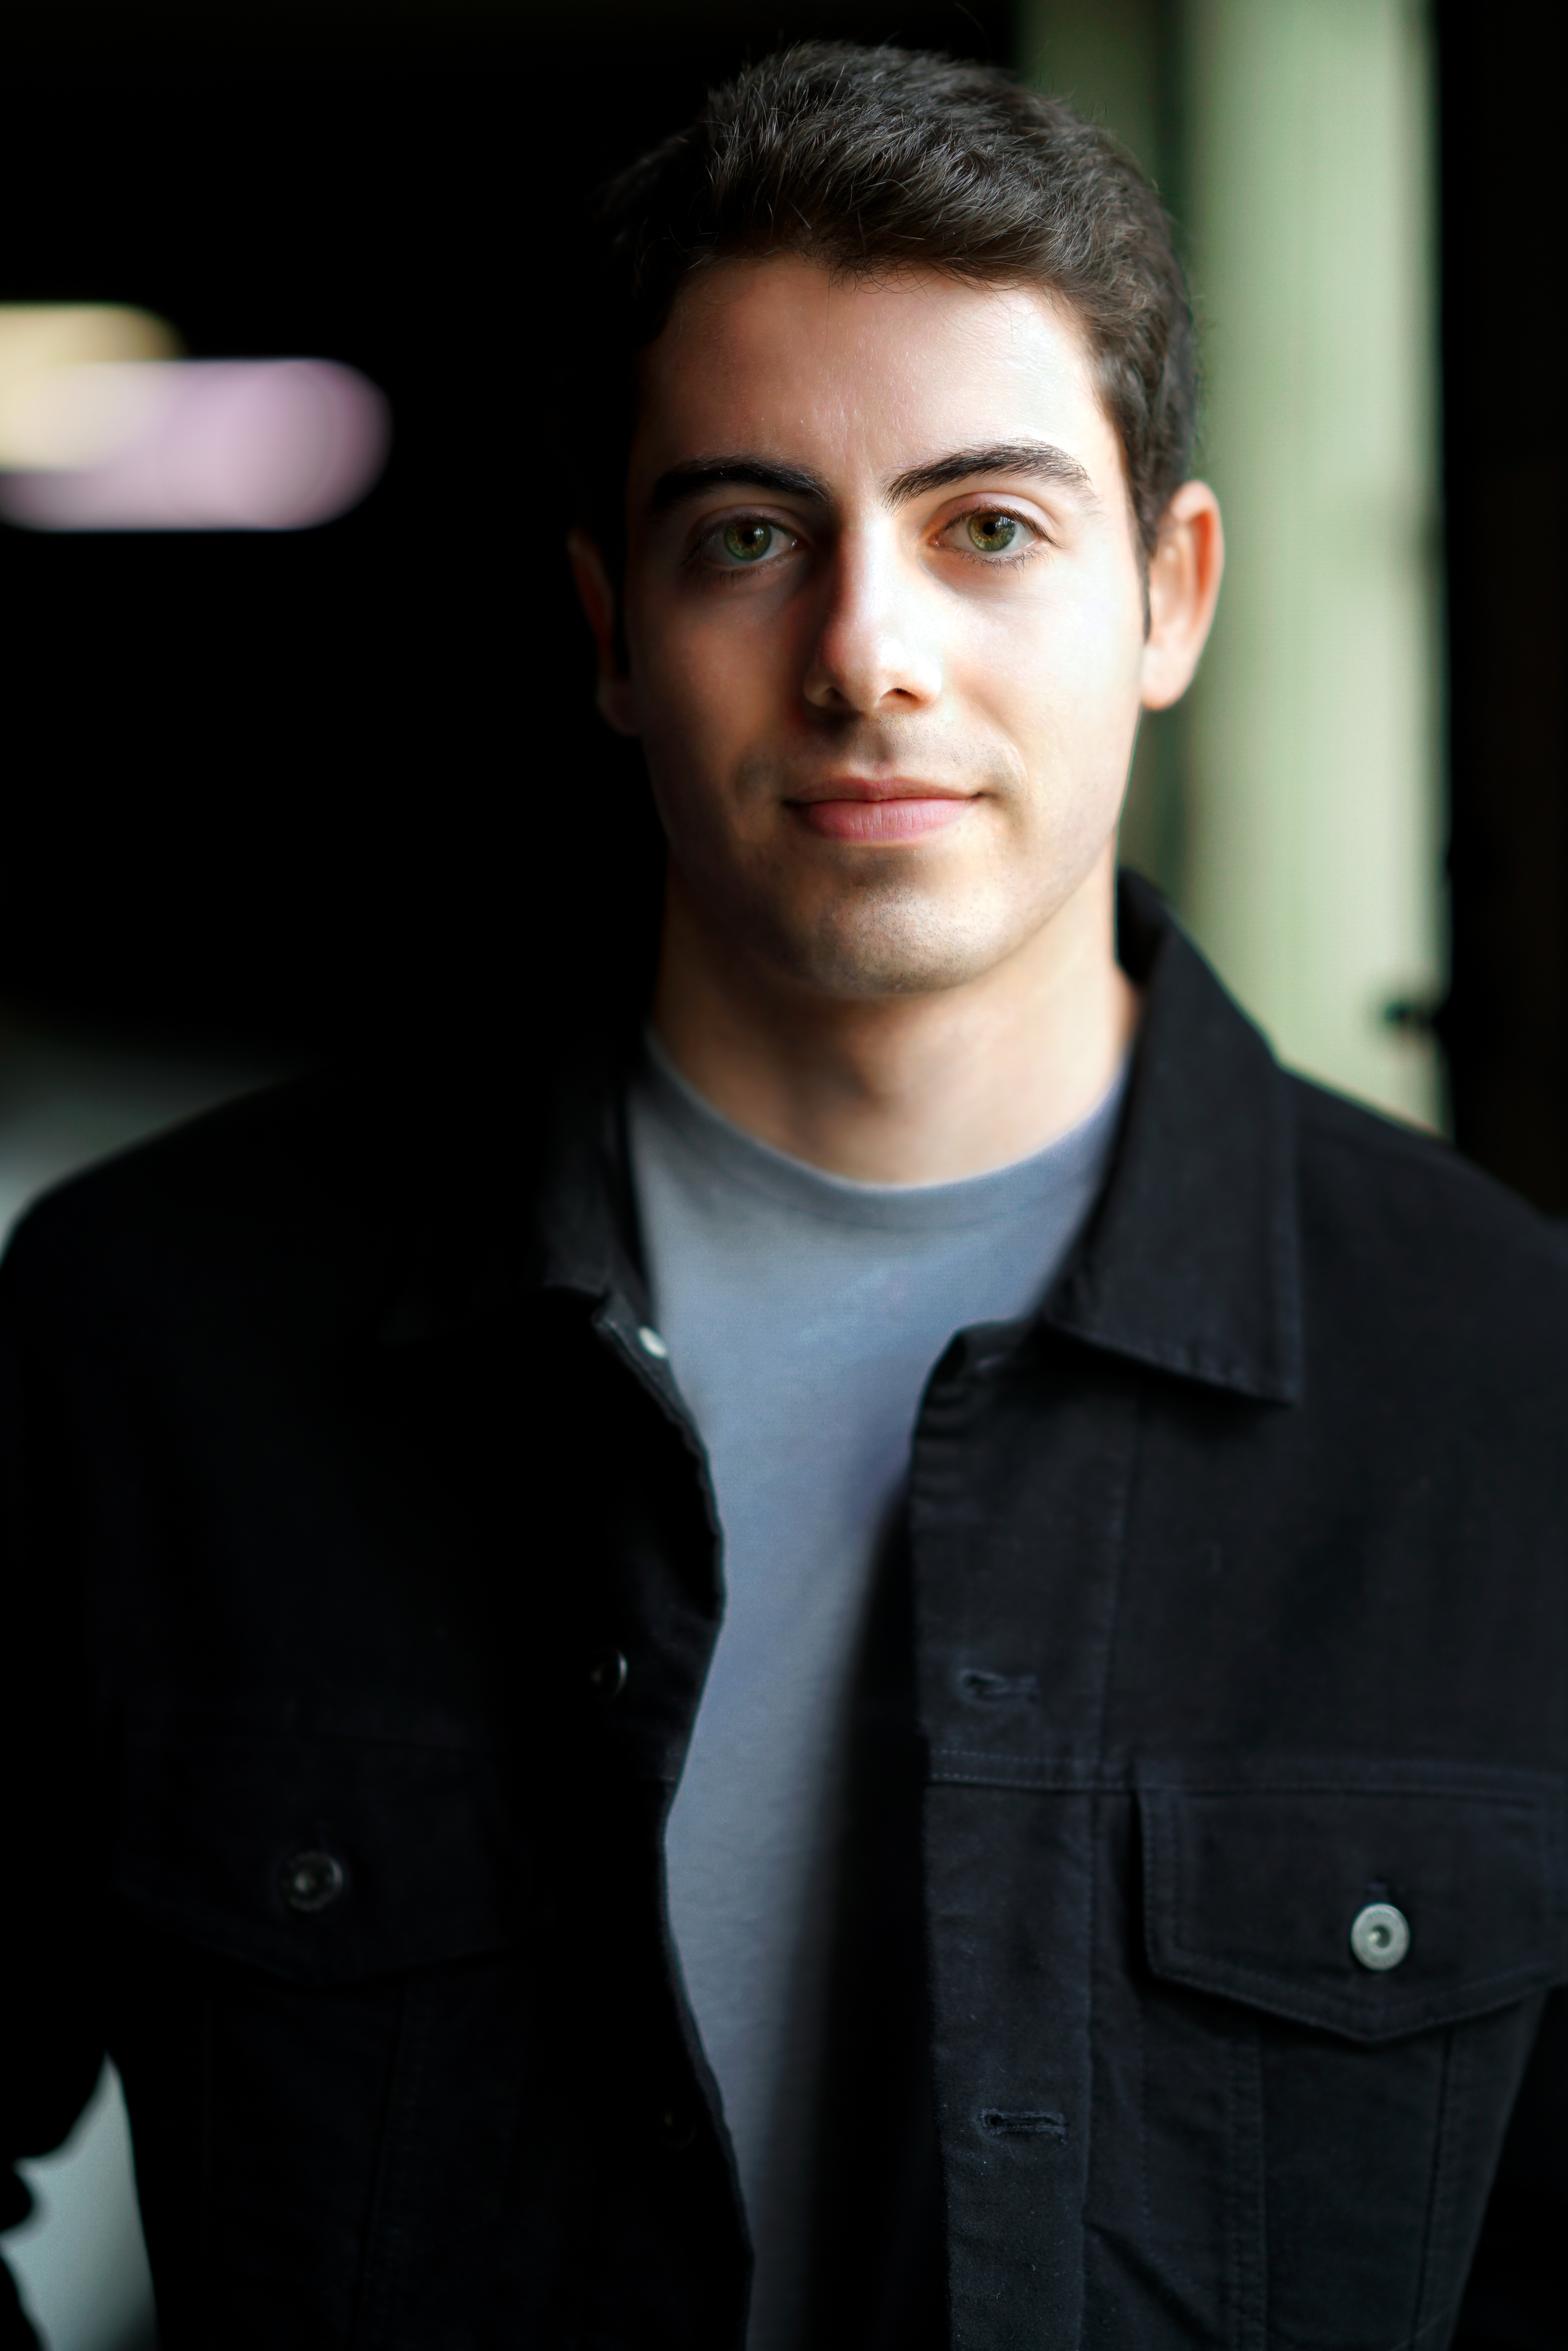 Sean Dassoff